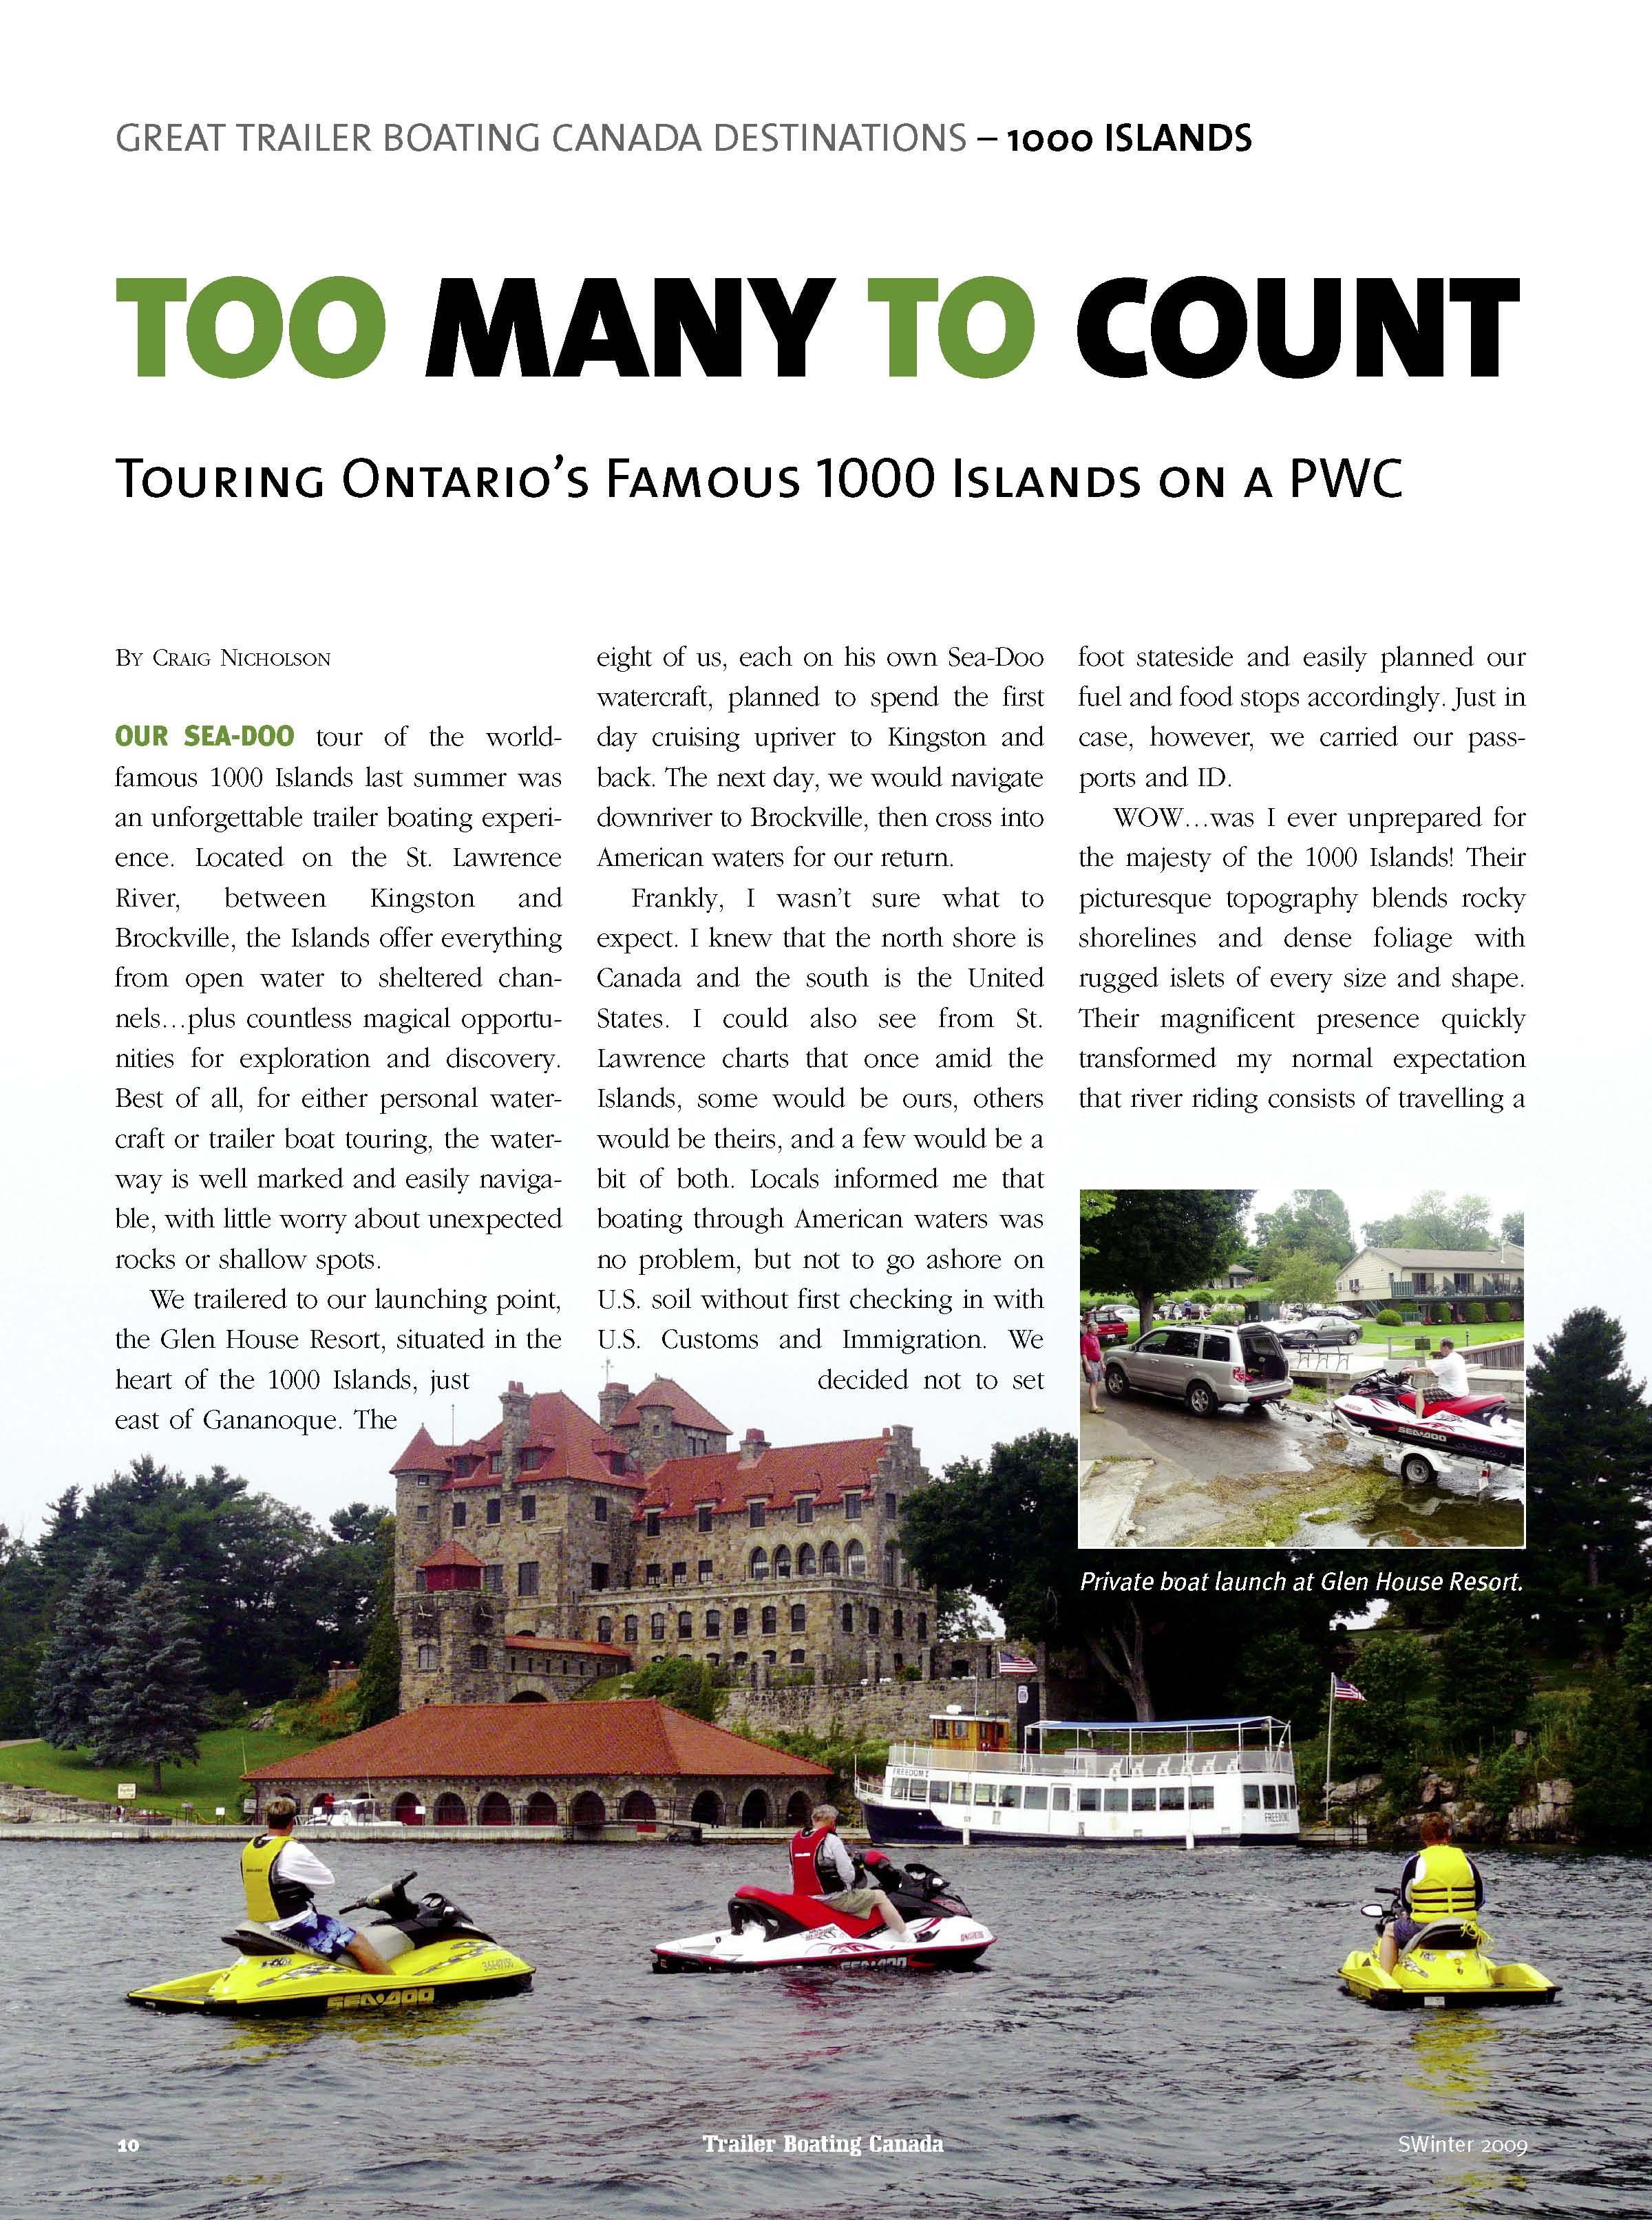 1000 Islands Sea Doo Tour